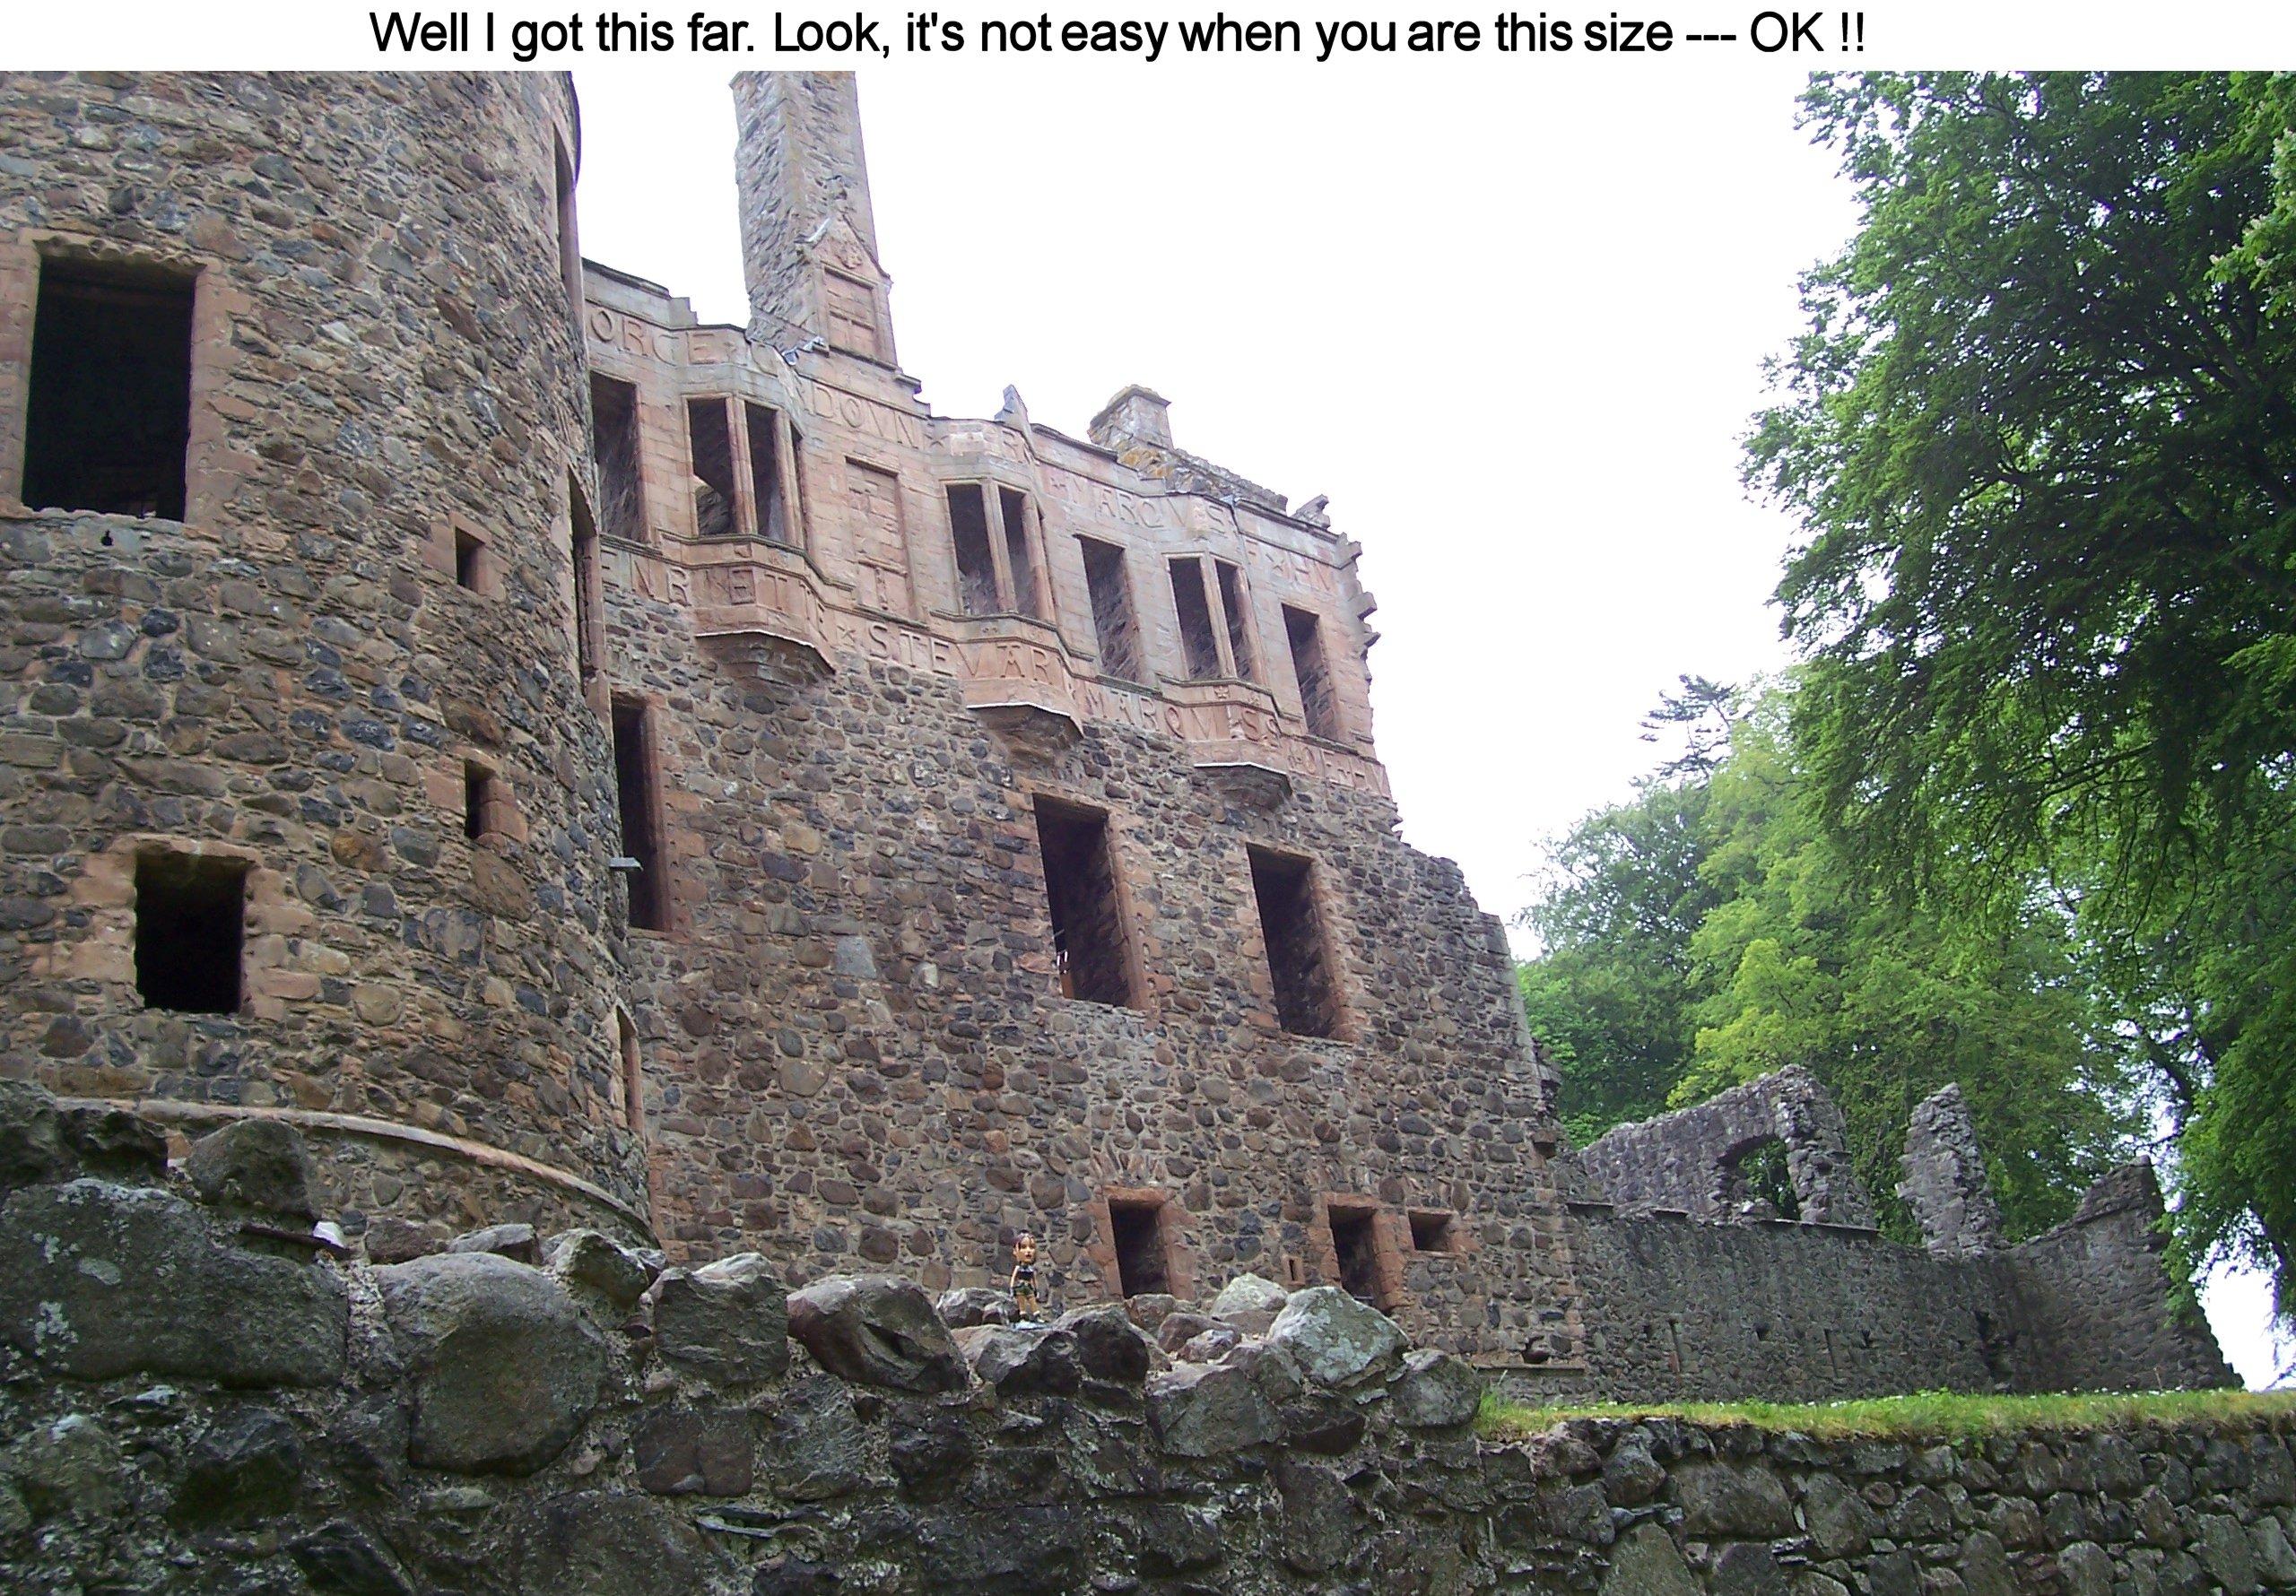 02817_Lara_in_Scotland_08_122_485lo.jpg